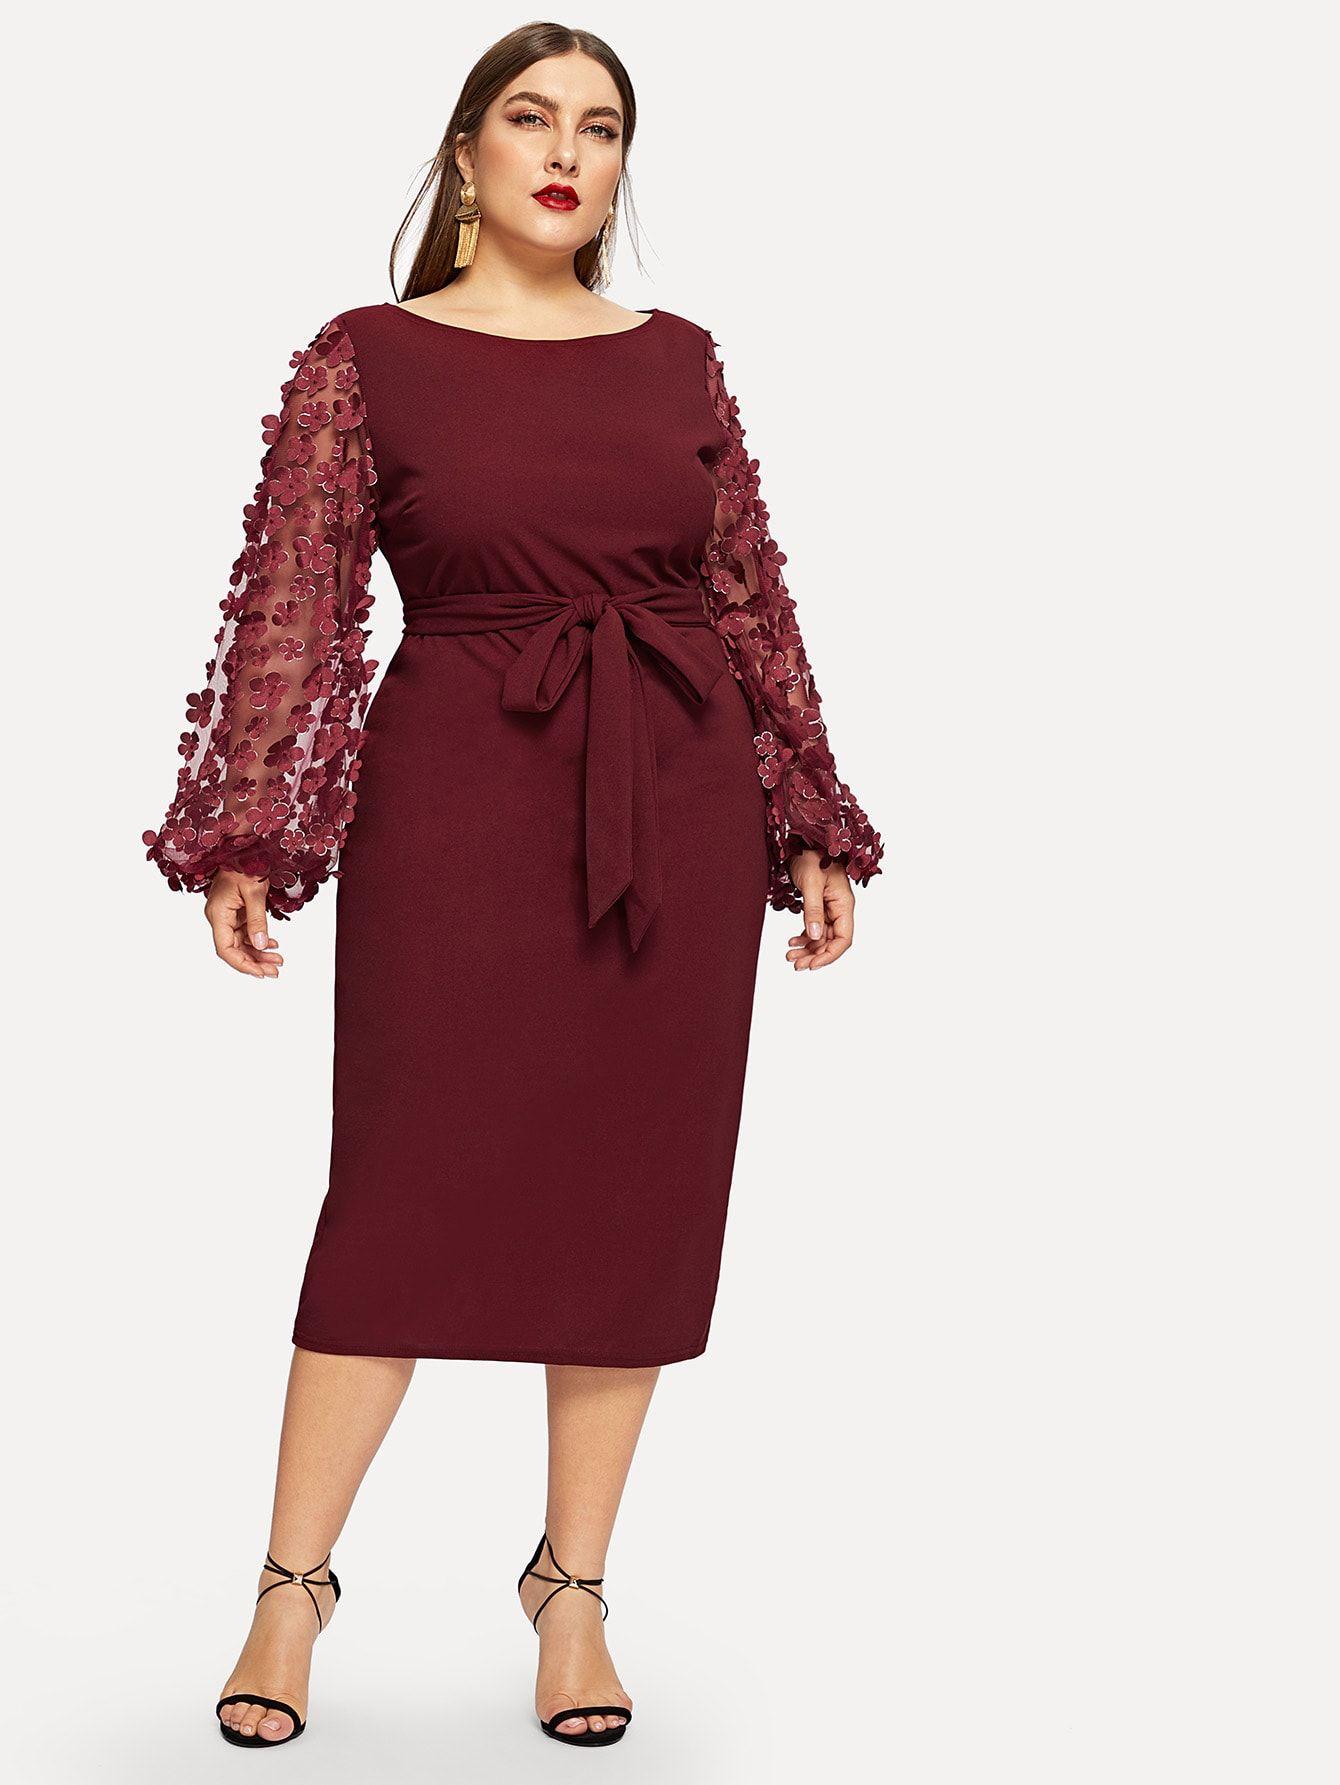 Plus applique mesh sleeve pencil dress with belt check out